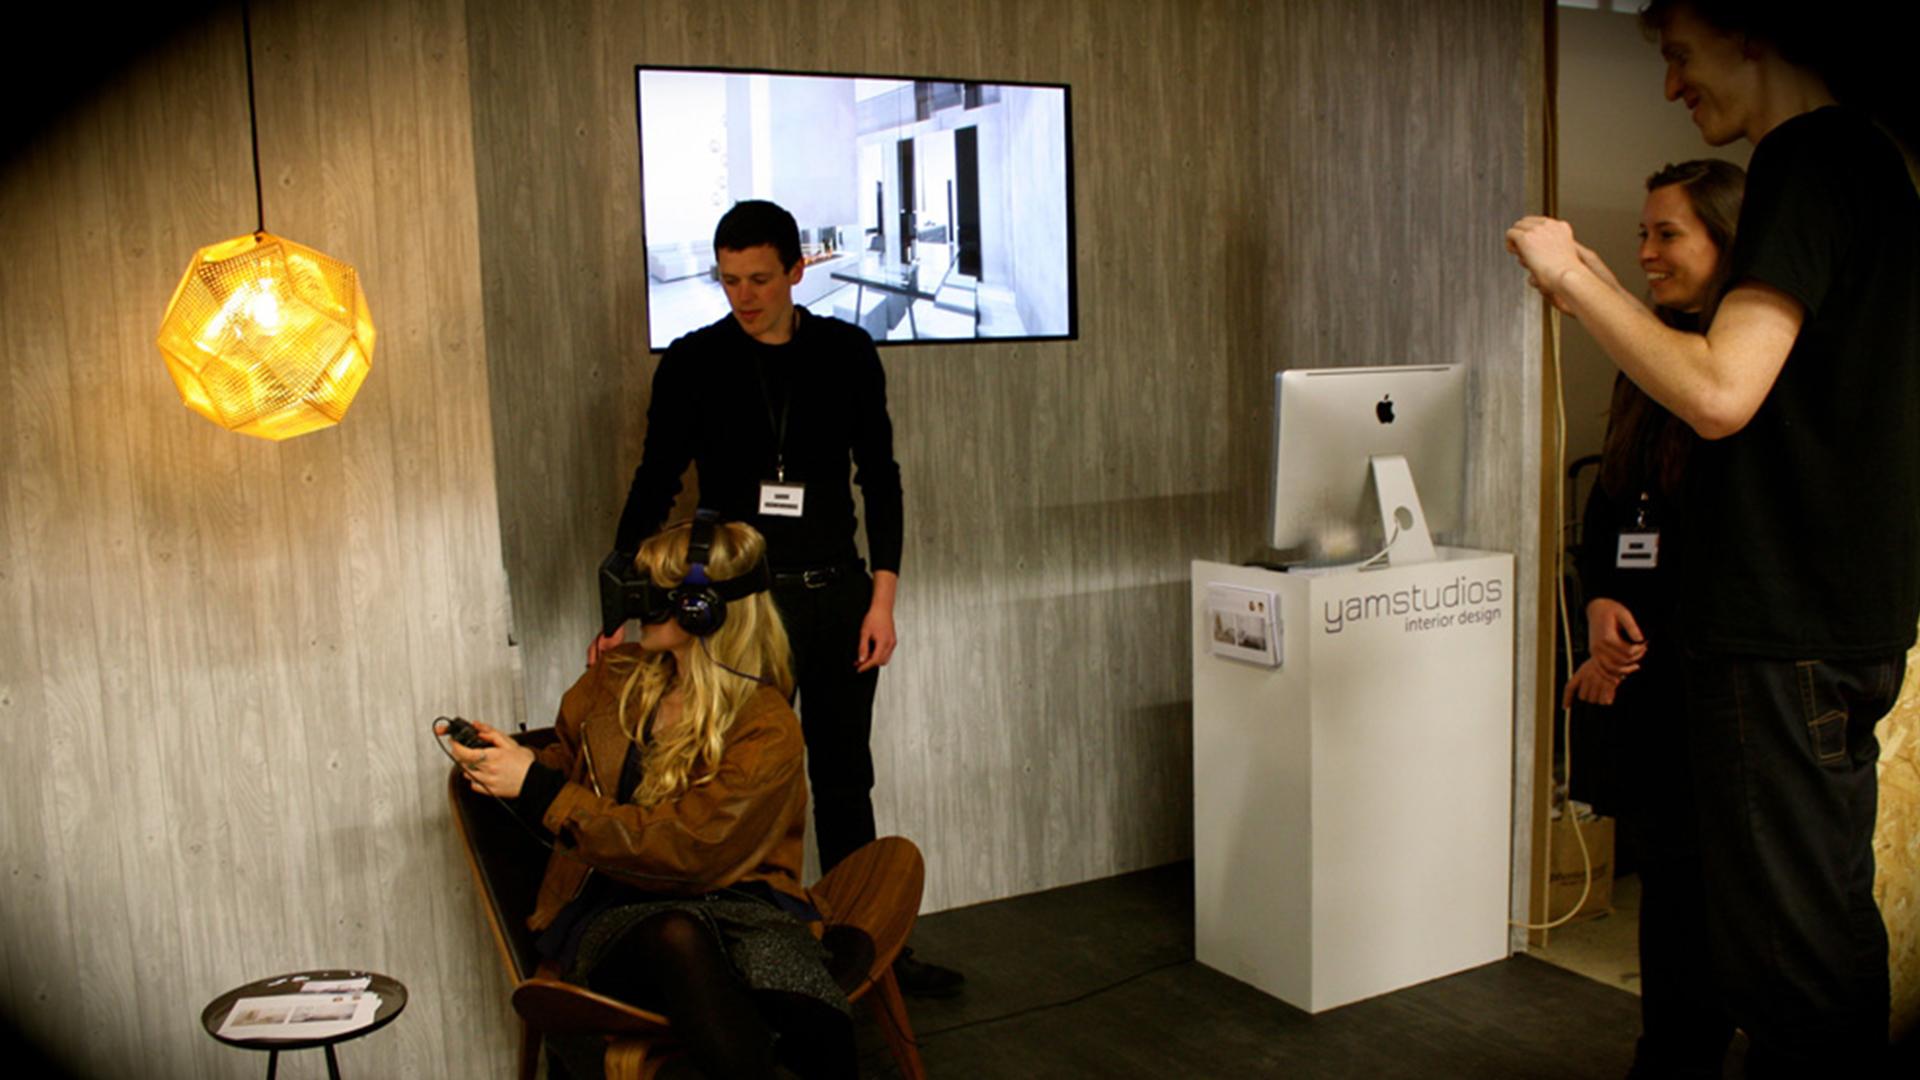 Yam Studios - VR oculus room